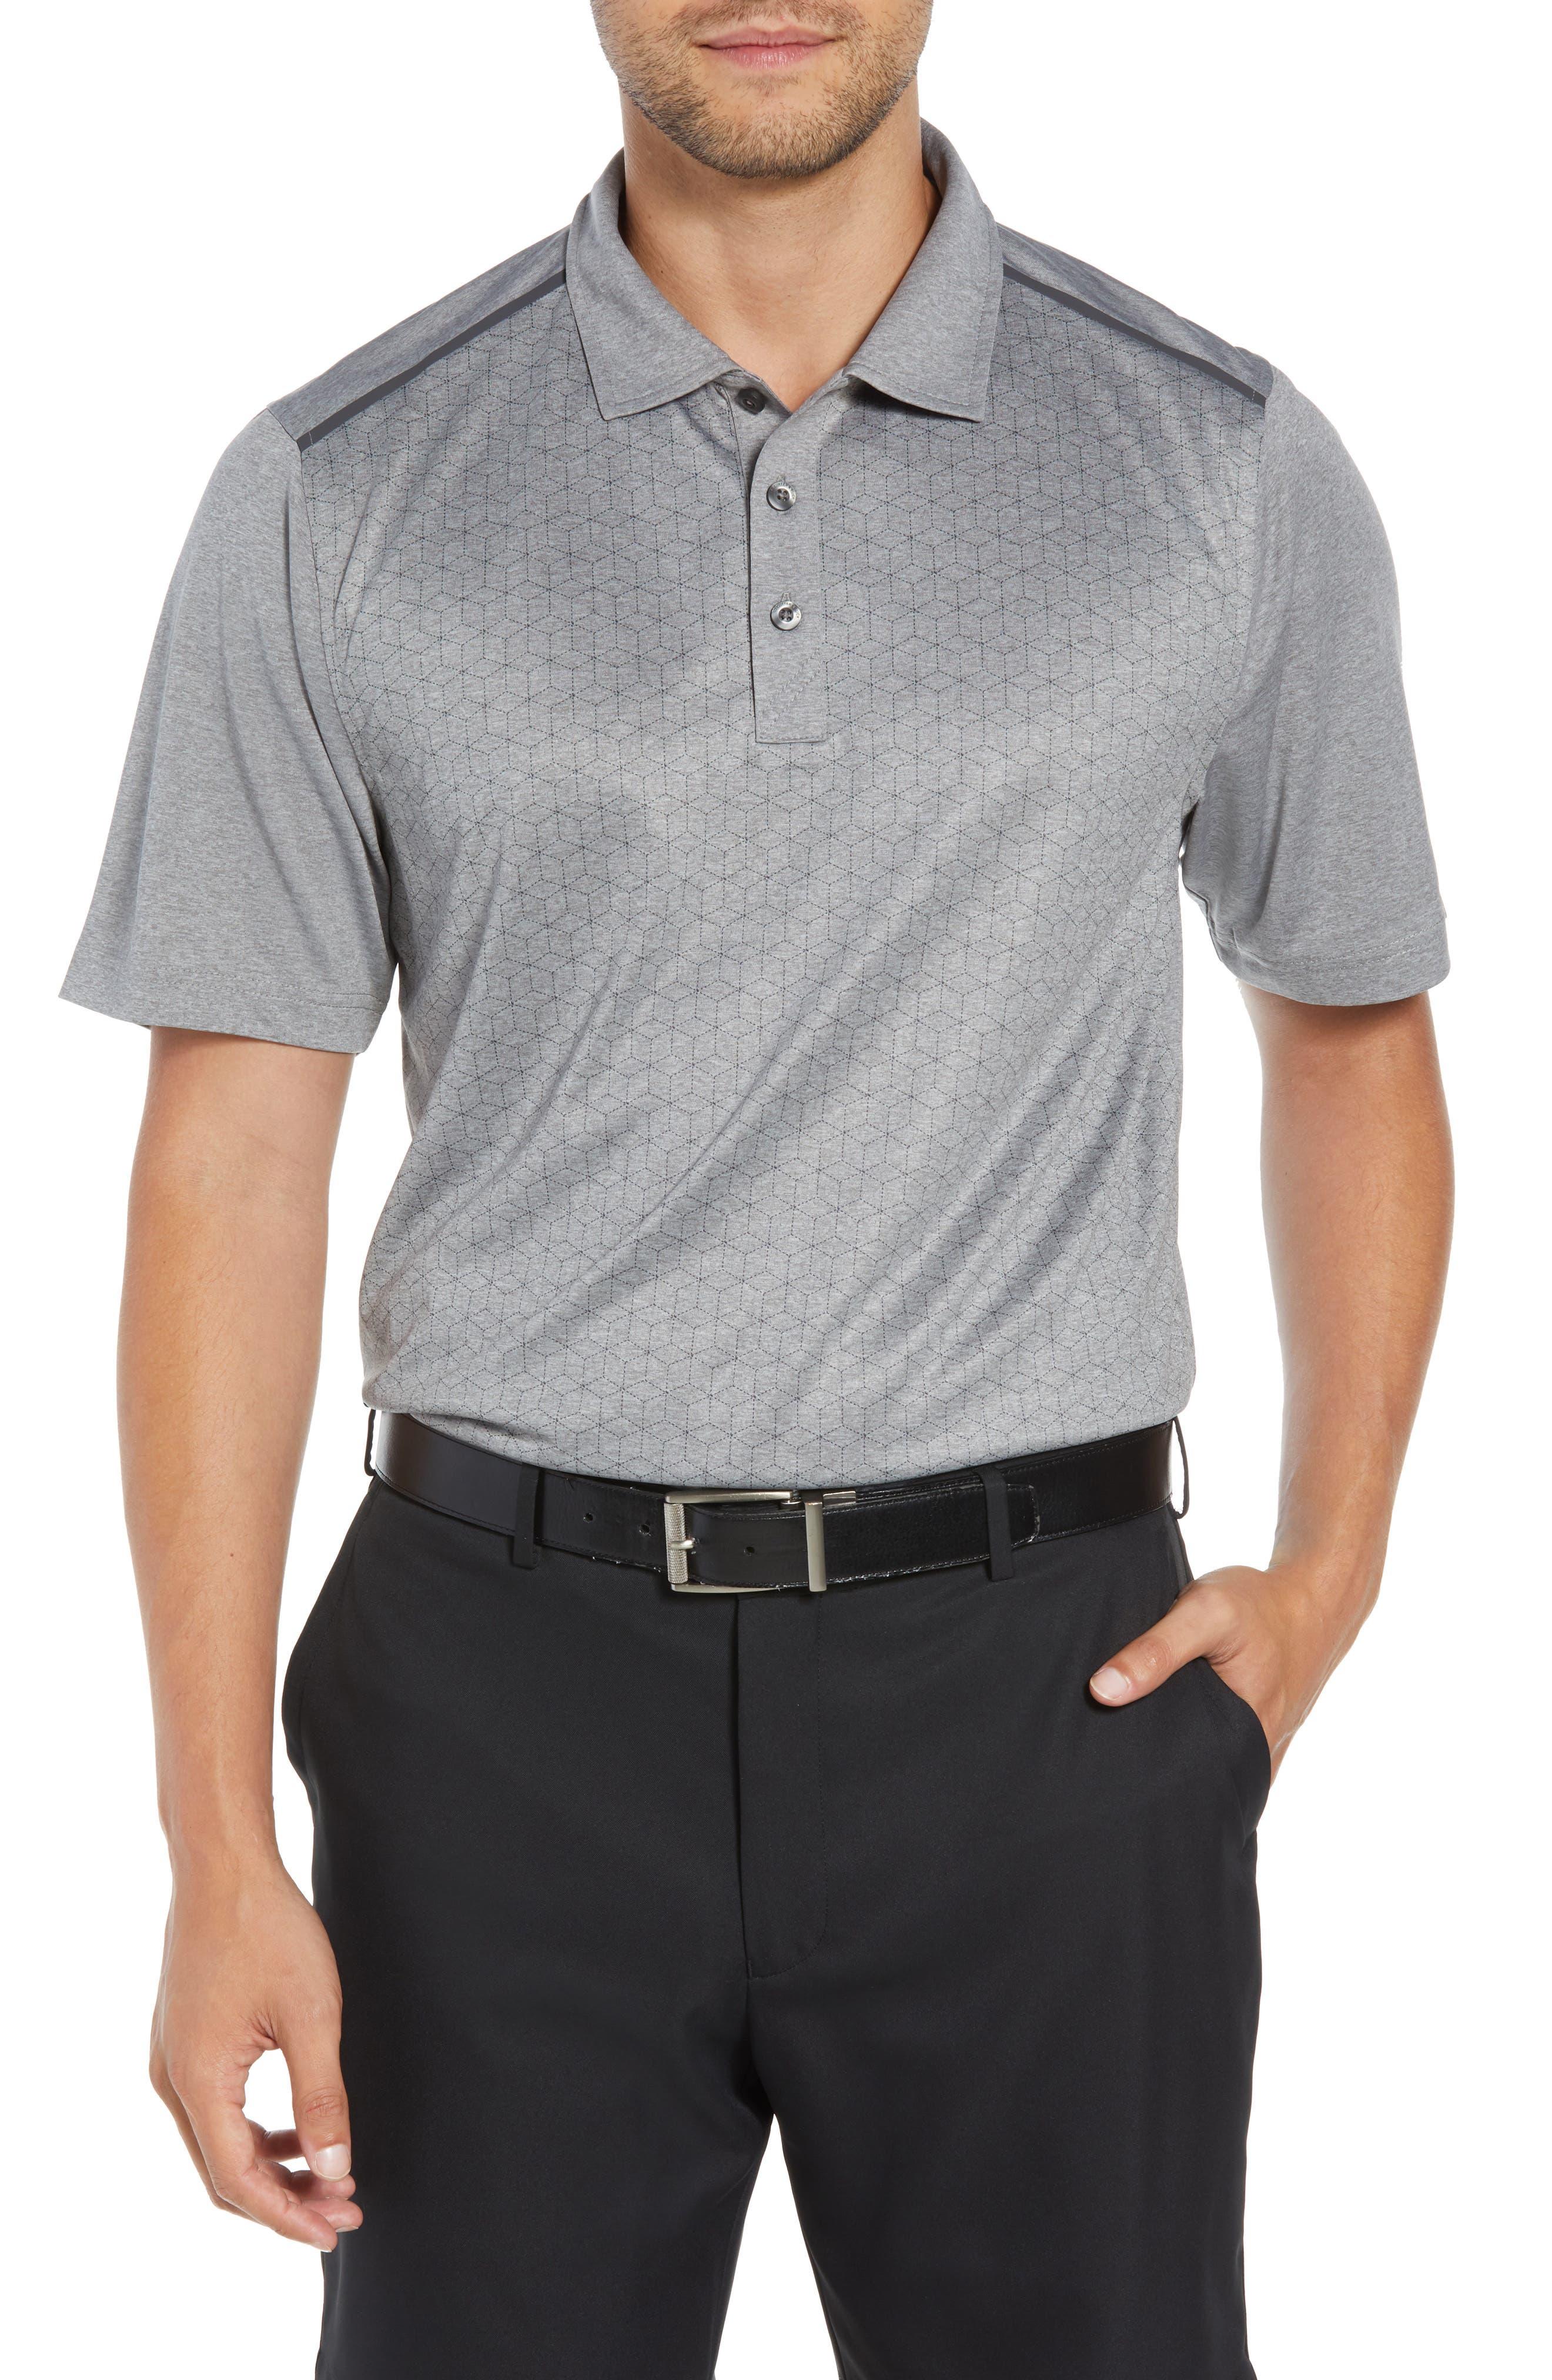 Cutter & Buck Kyle Drytec Jersey Polo, Grey